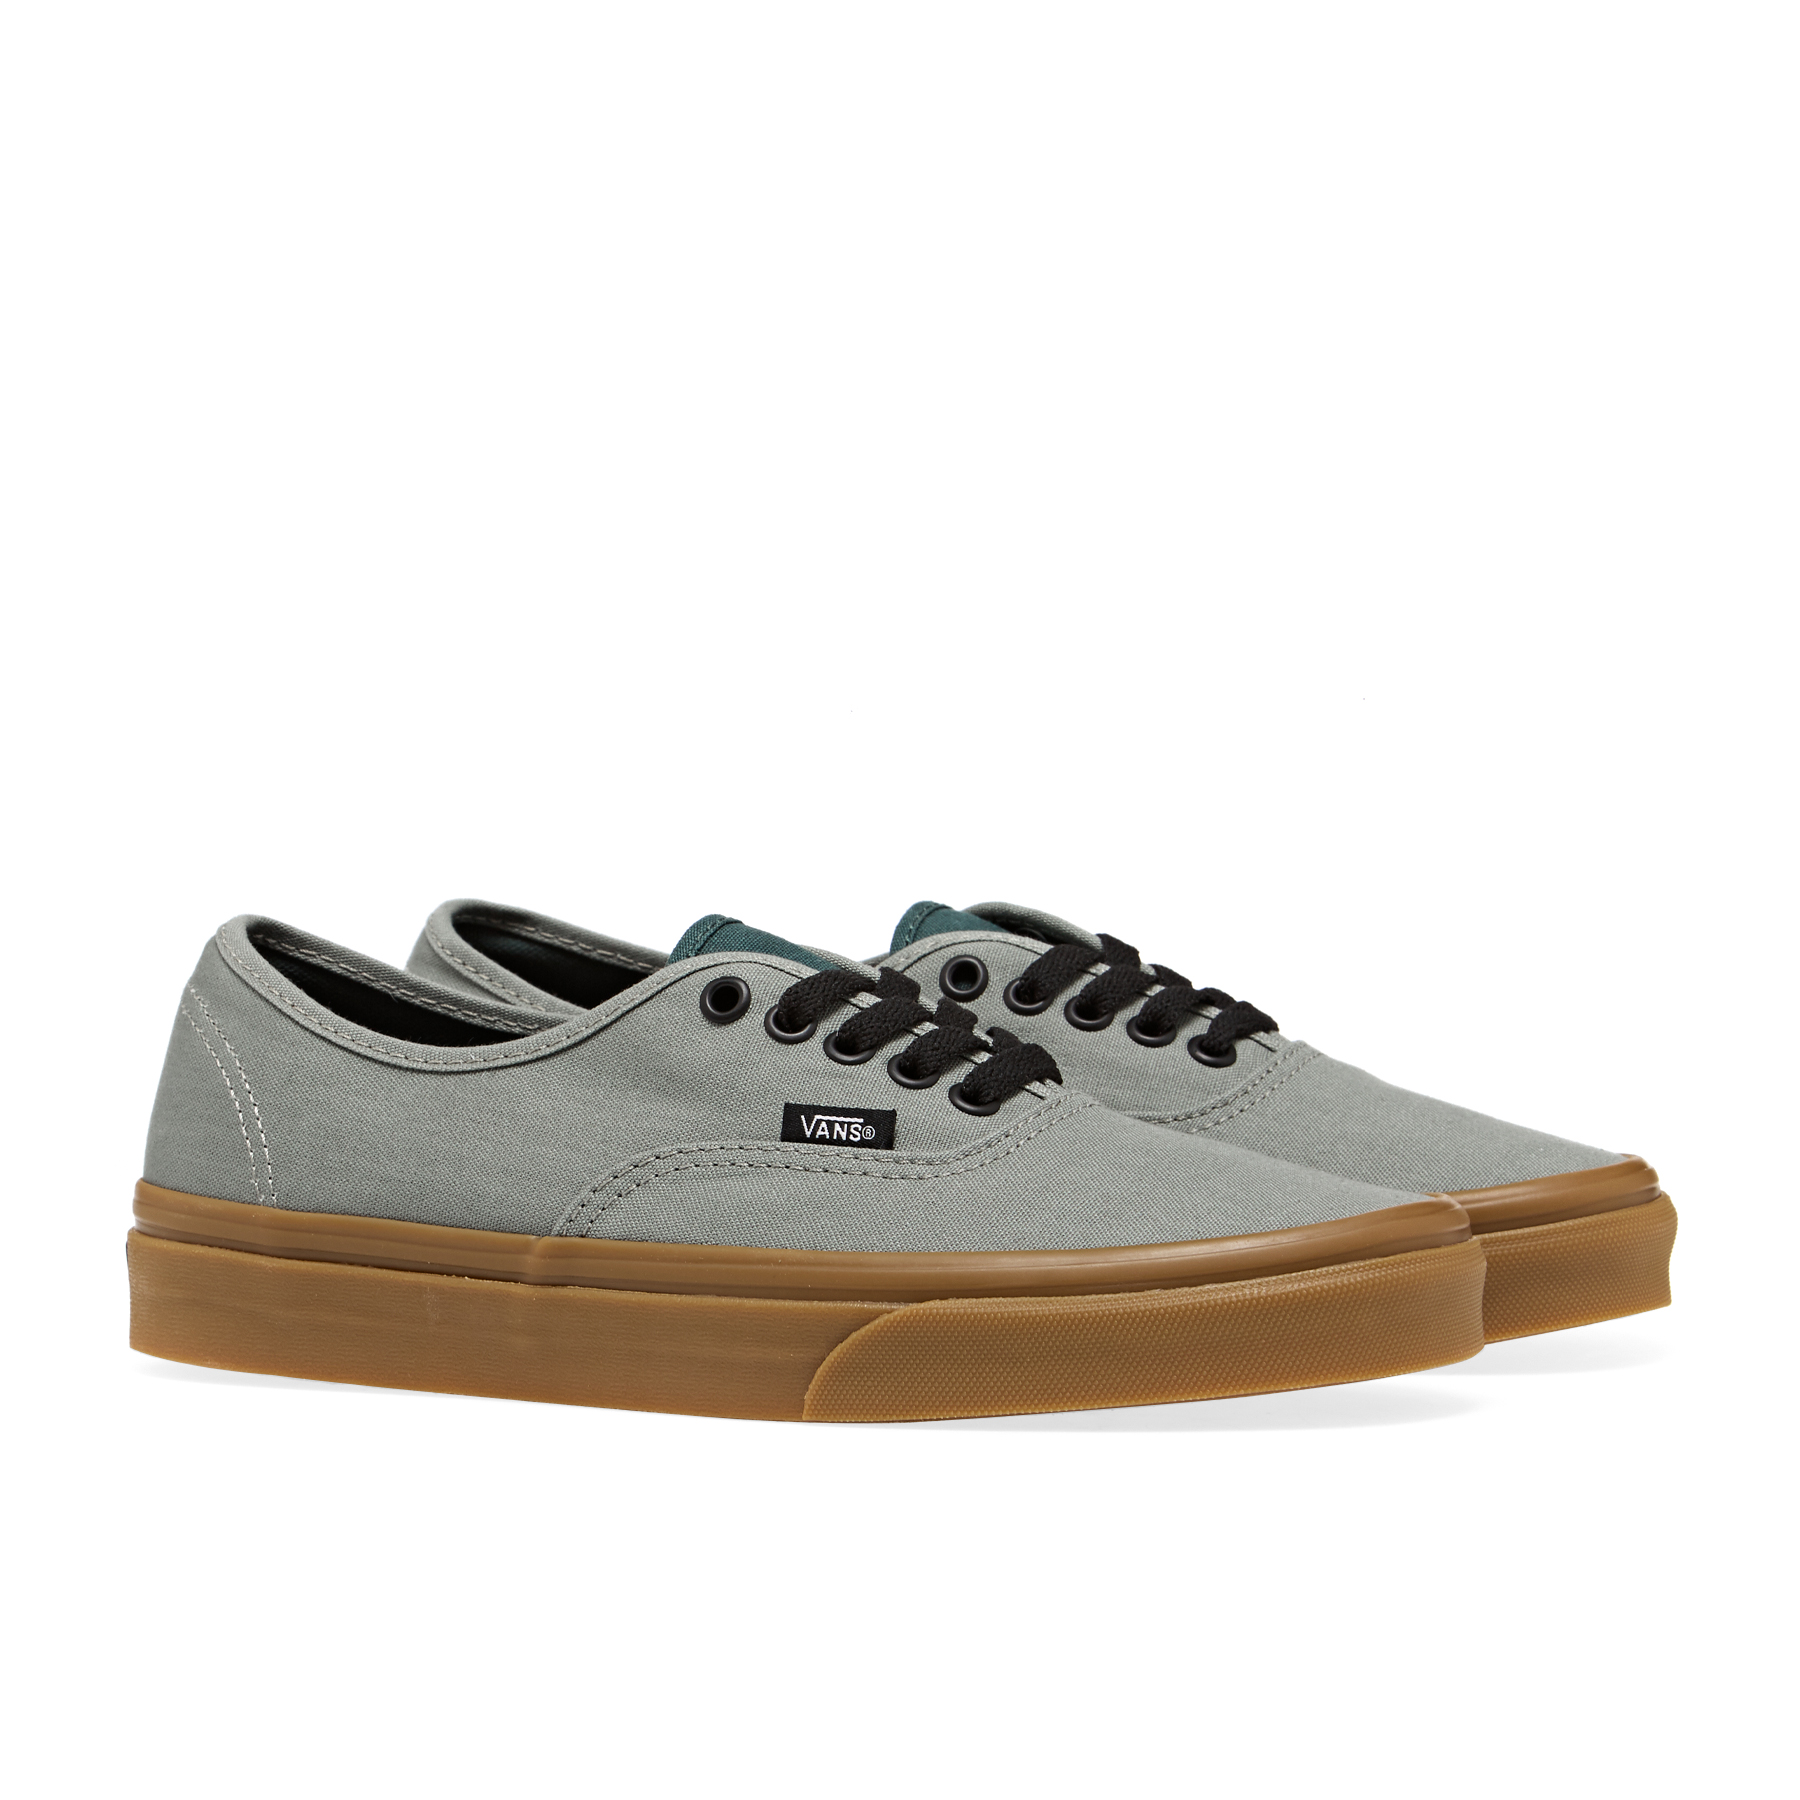 chaussures gum authentic vans